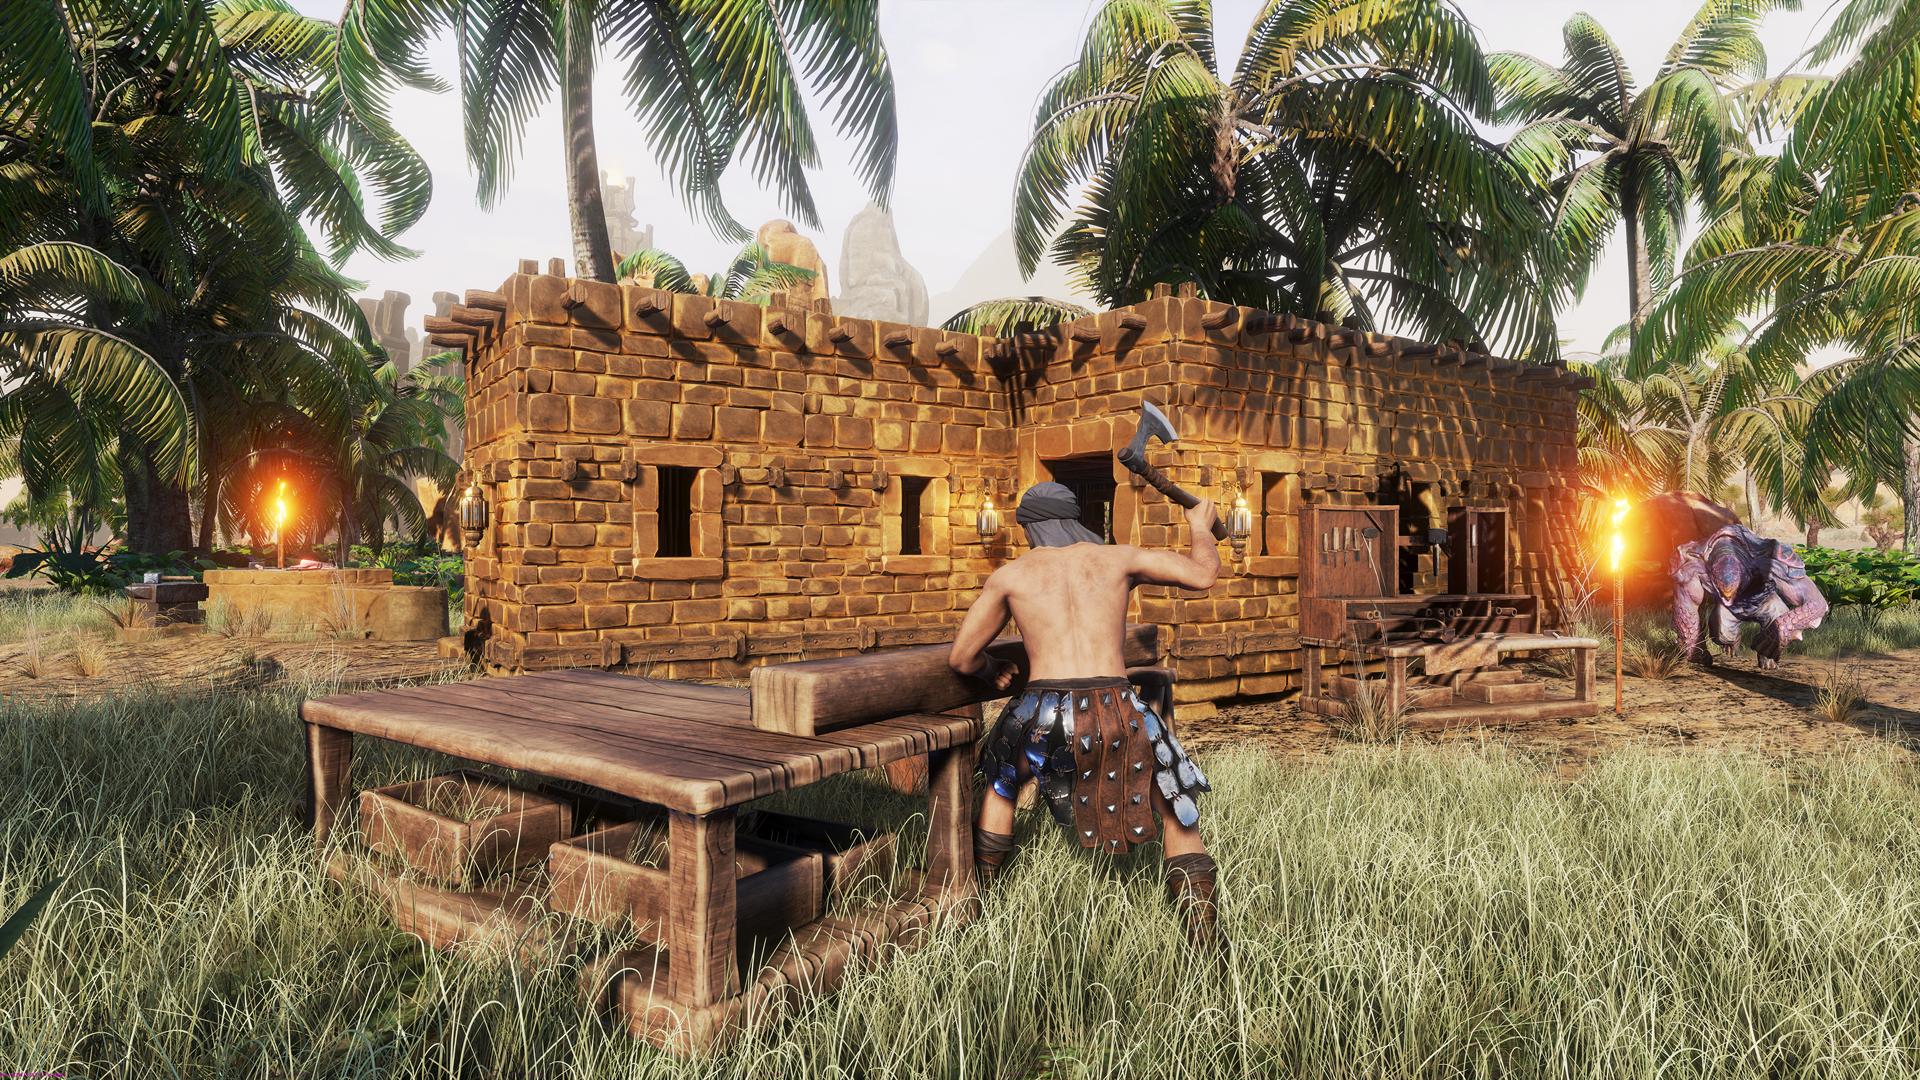 Conan Exiles - Crafting und Siedlungsbau